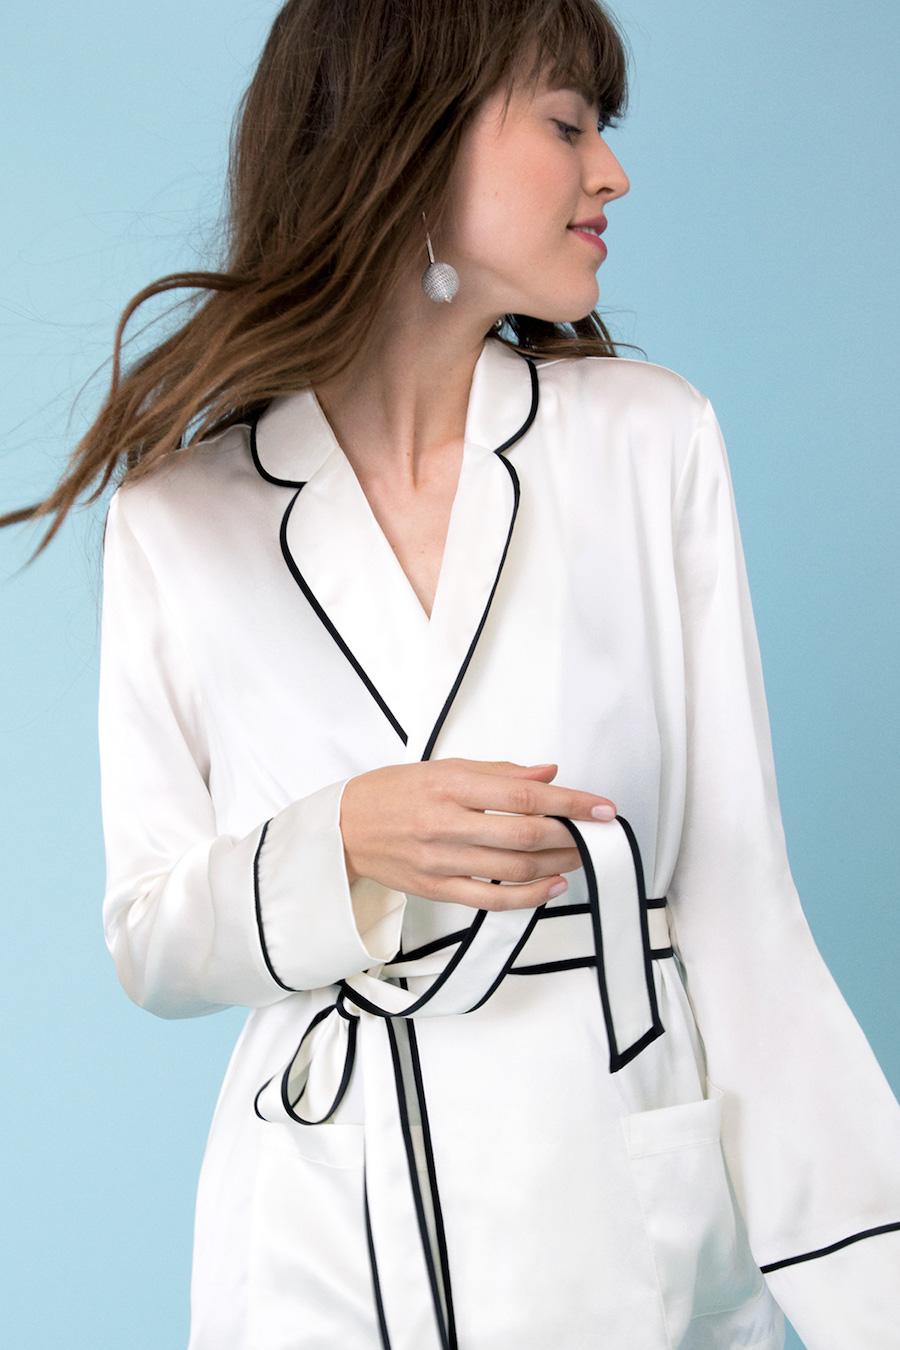 Frances Austen's white pajama jacket with black detailing